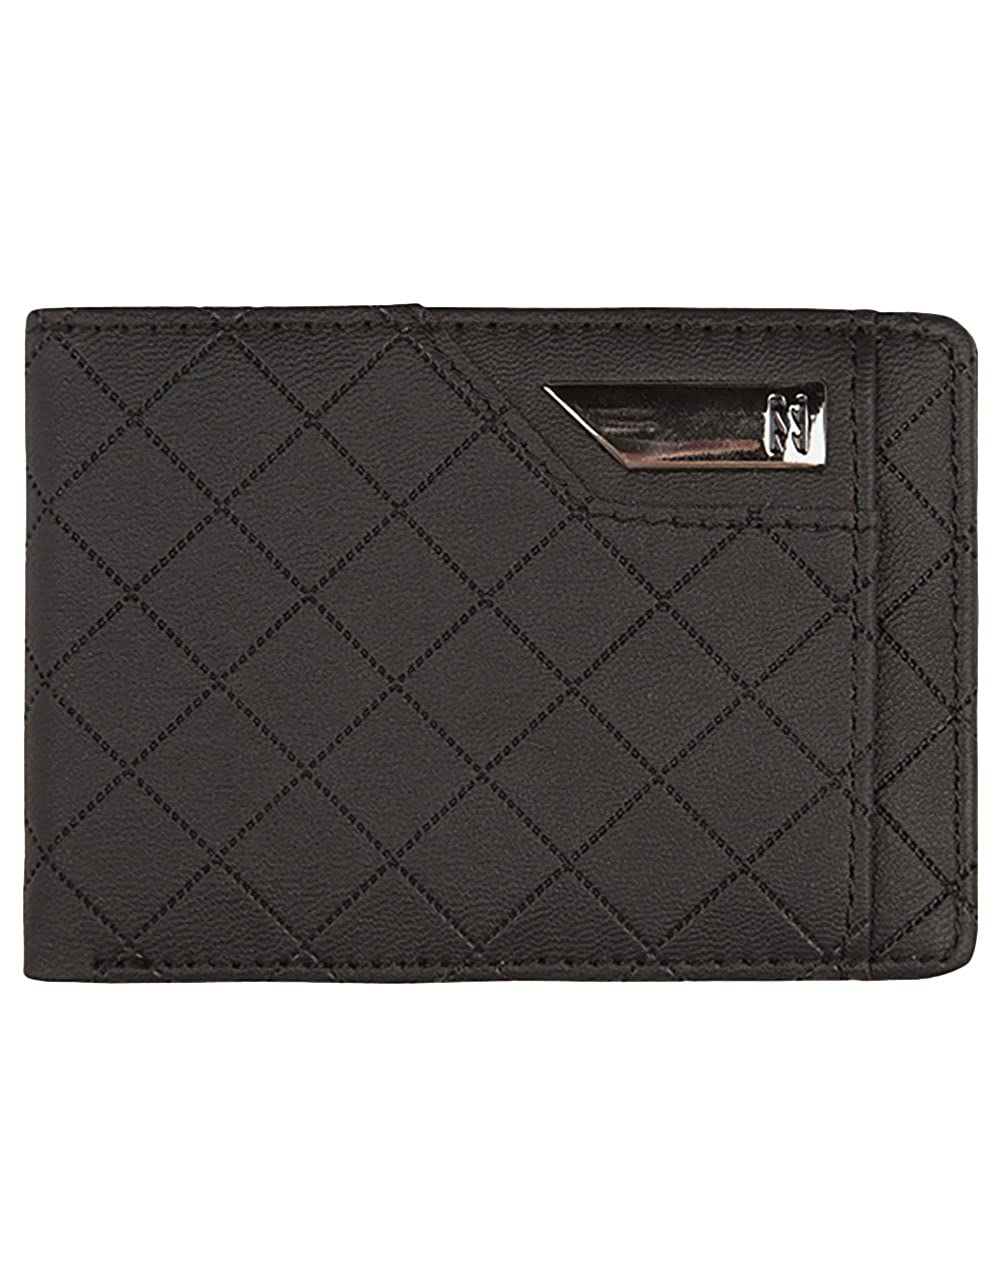 BILLABONG Capture Wallet, Black 17085710001